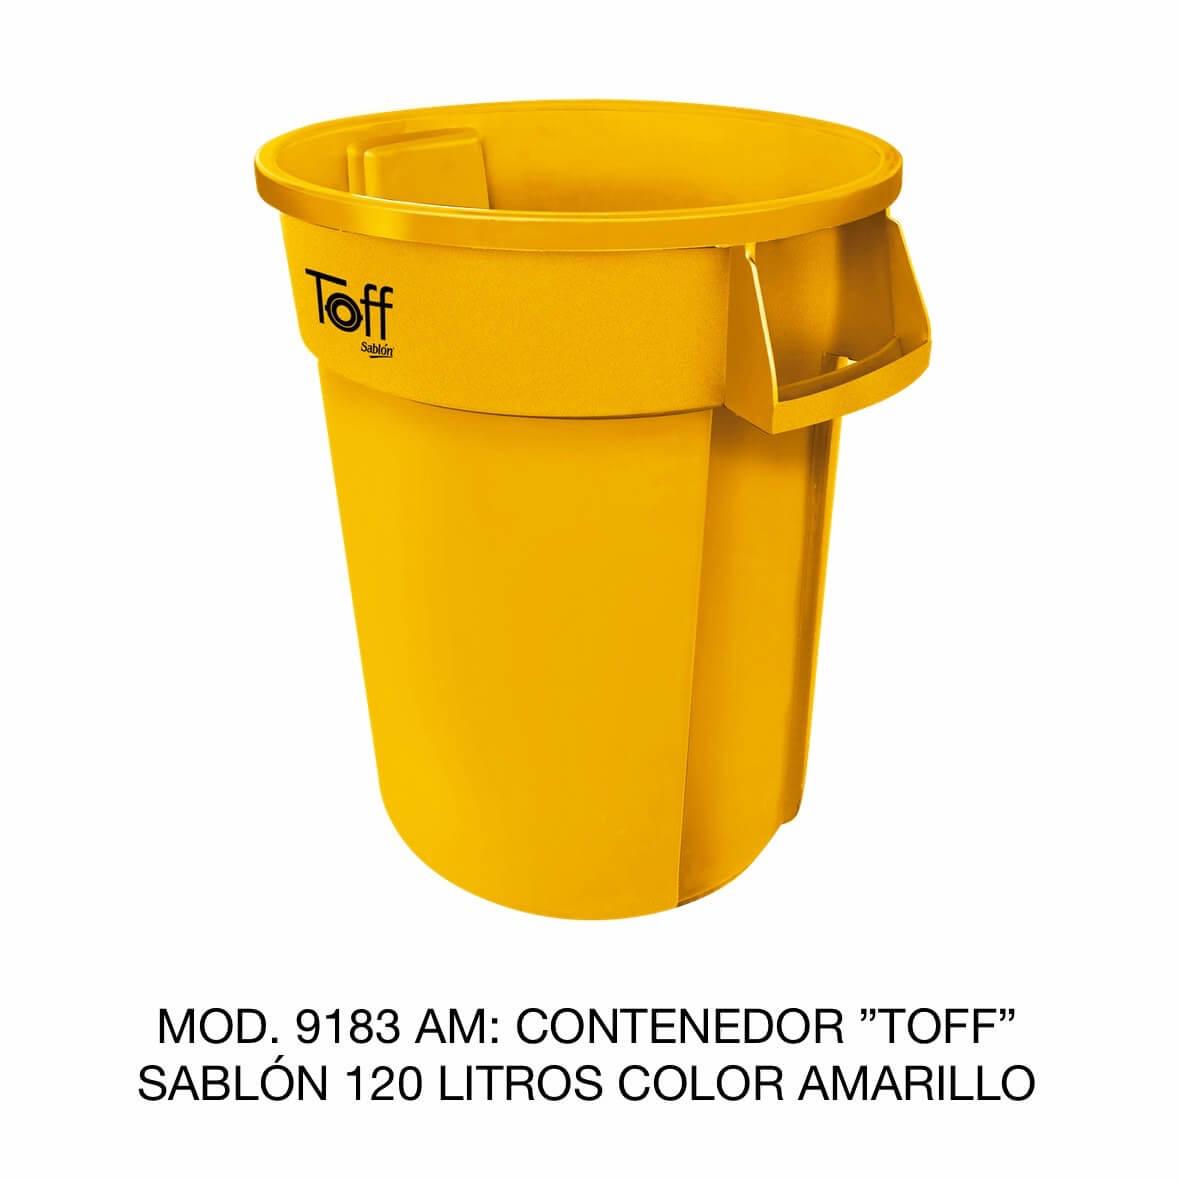 Contenedor de basura Sablón modelo TOFF de 120 litros Modelo 9183 AM Color Amarillo